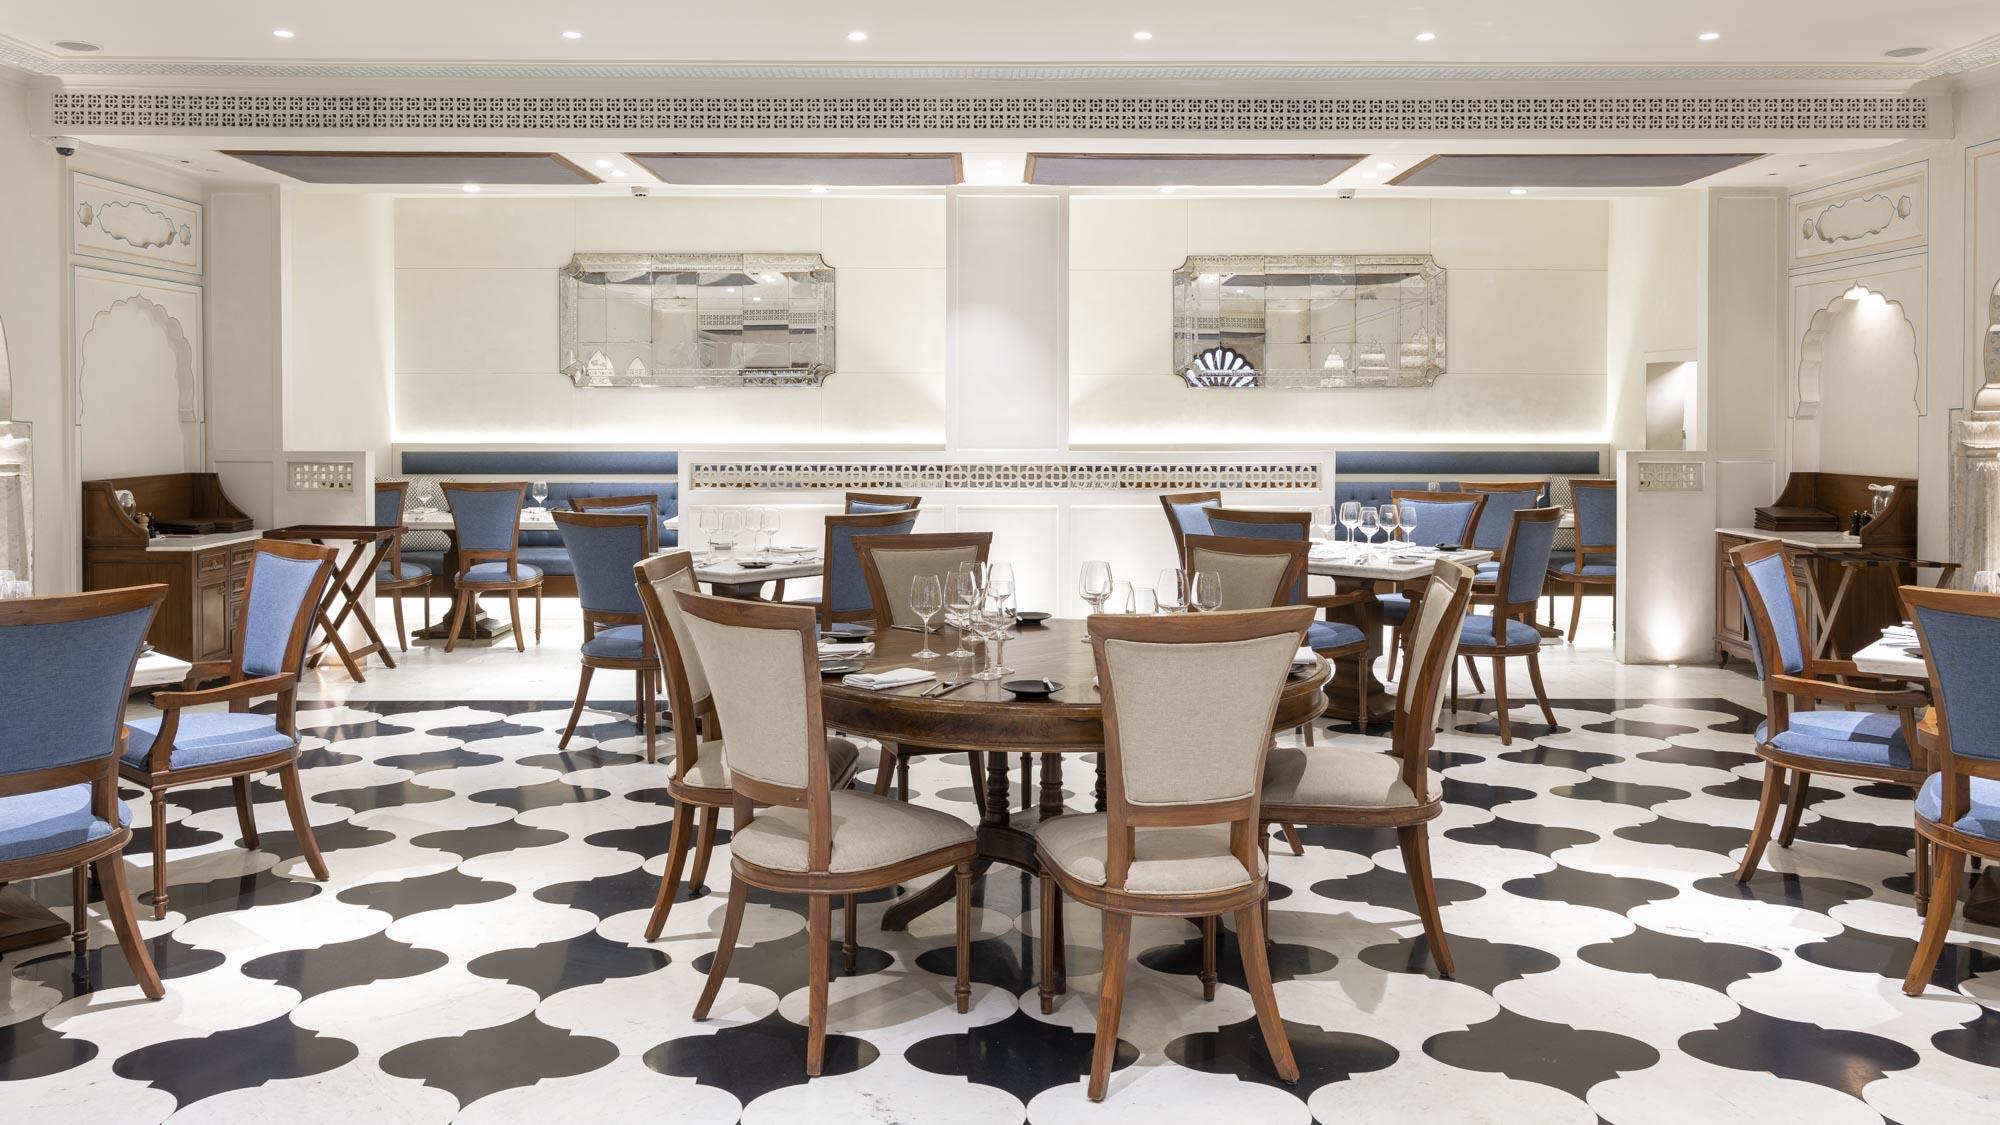 Alila Fort Bishangarh Jaipur India Hospitality Photography Interior Hotel Singapore Coco Creative Studio 39-5